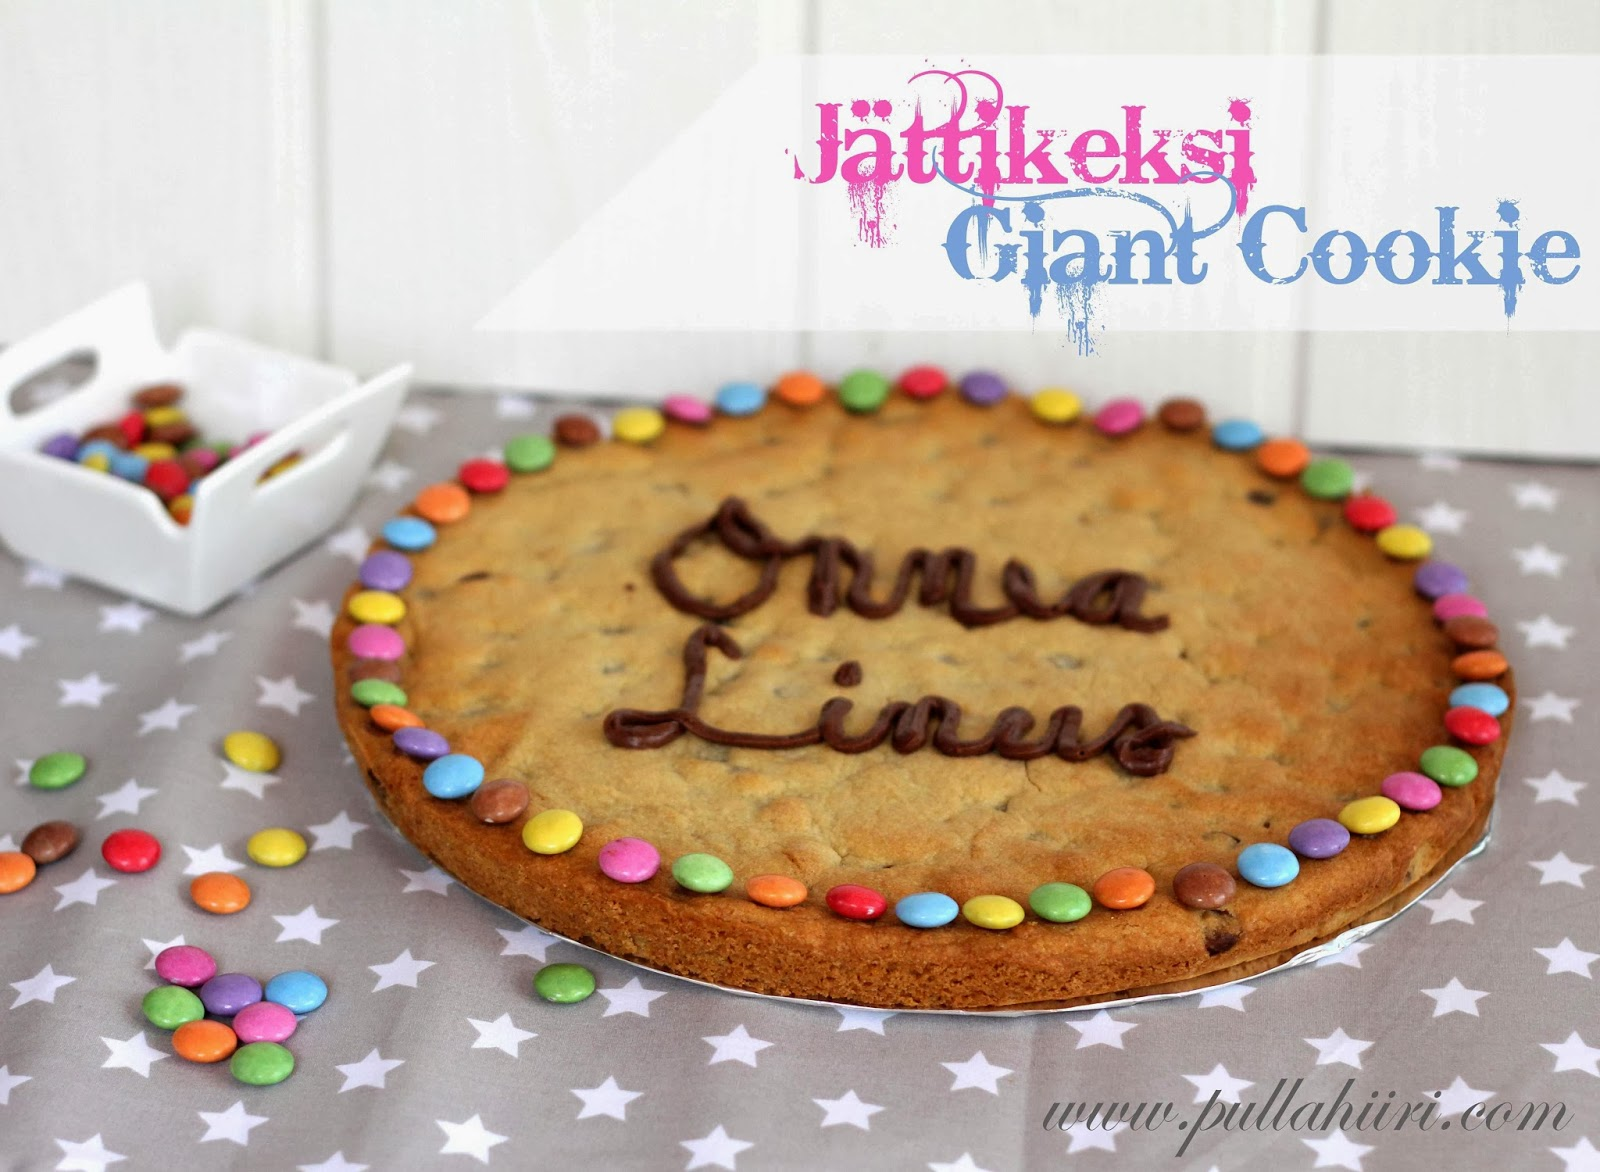 http://www.pullahiiri.com/2013/10/jattikeksi-giant-cookie.html